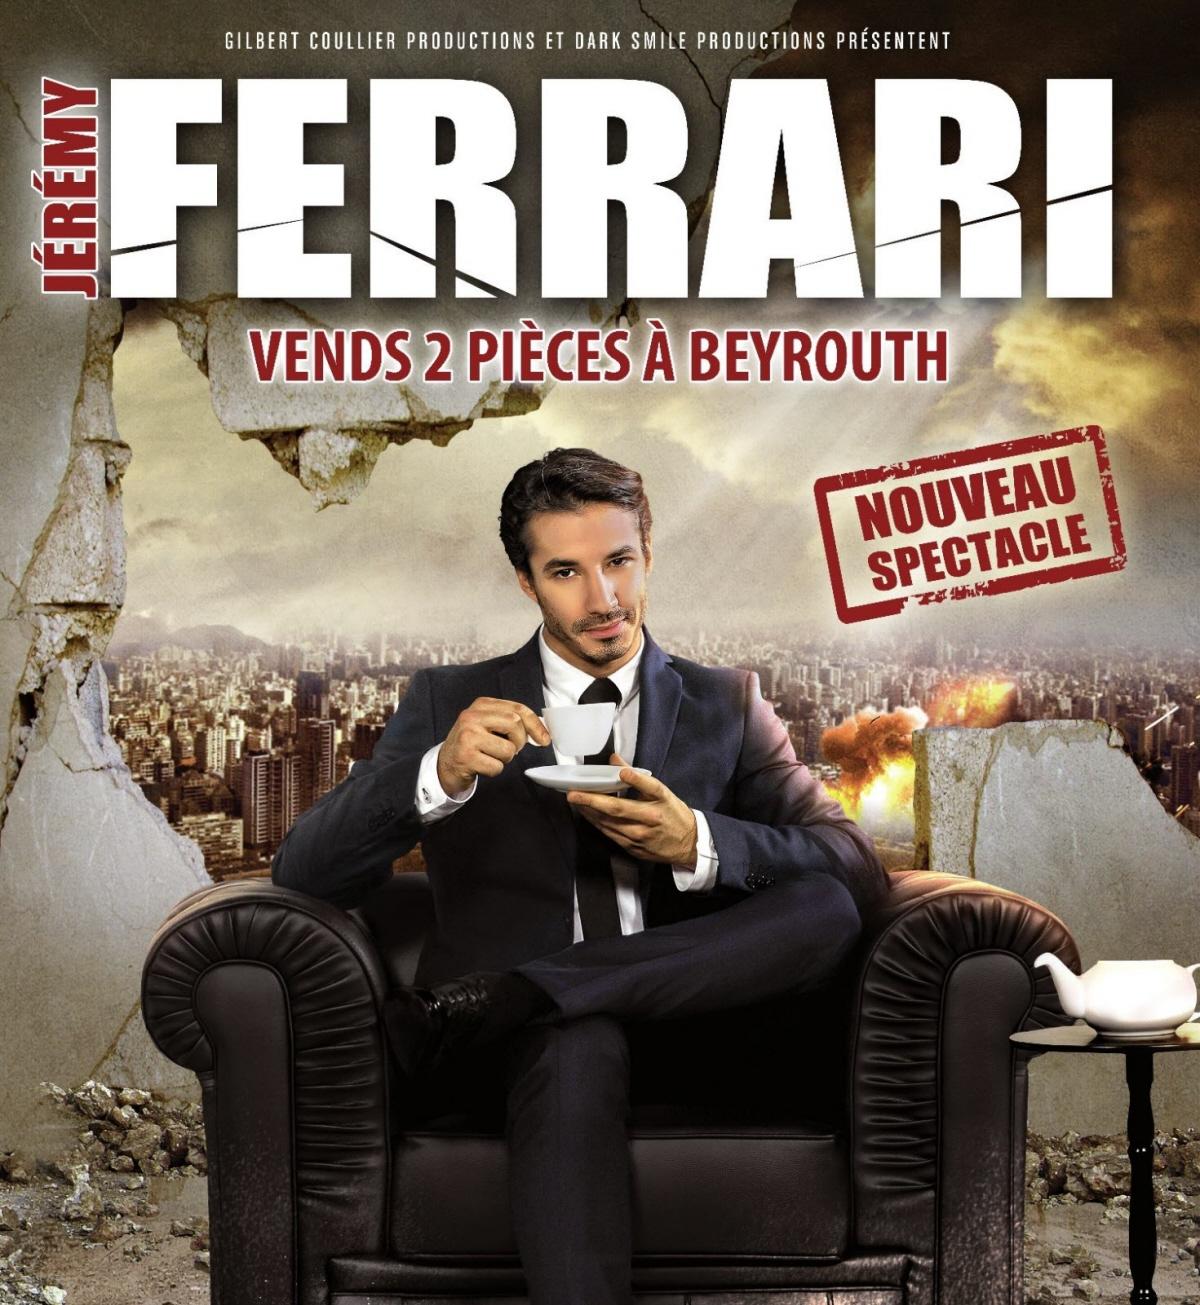 Jeremy Ferrari affiche